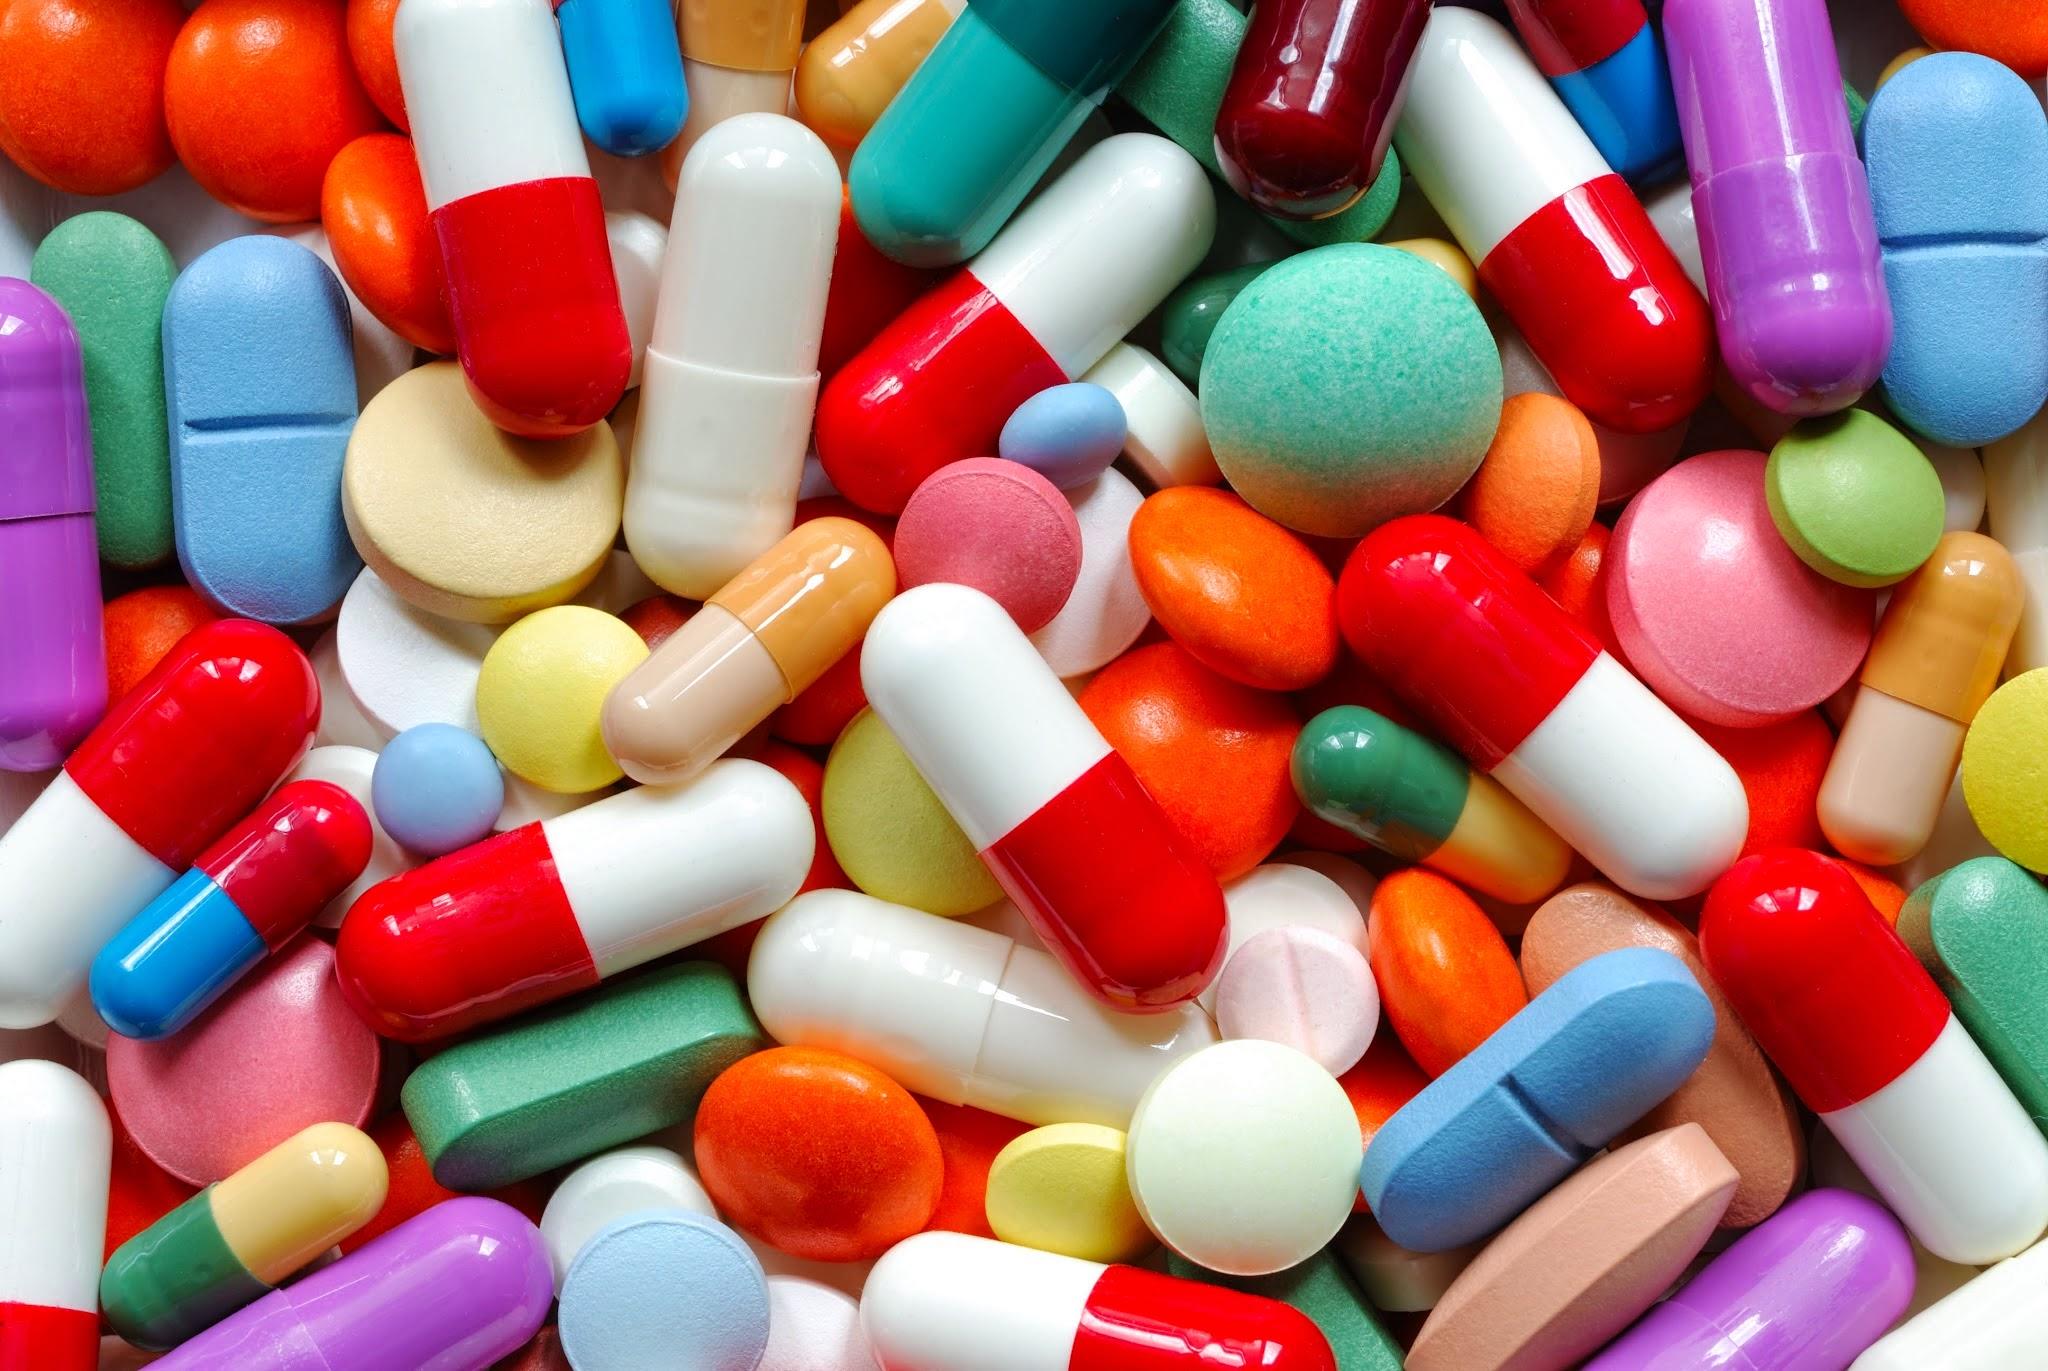 730 : detrazione spese sanitarie patologie esenti